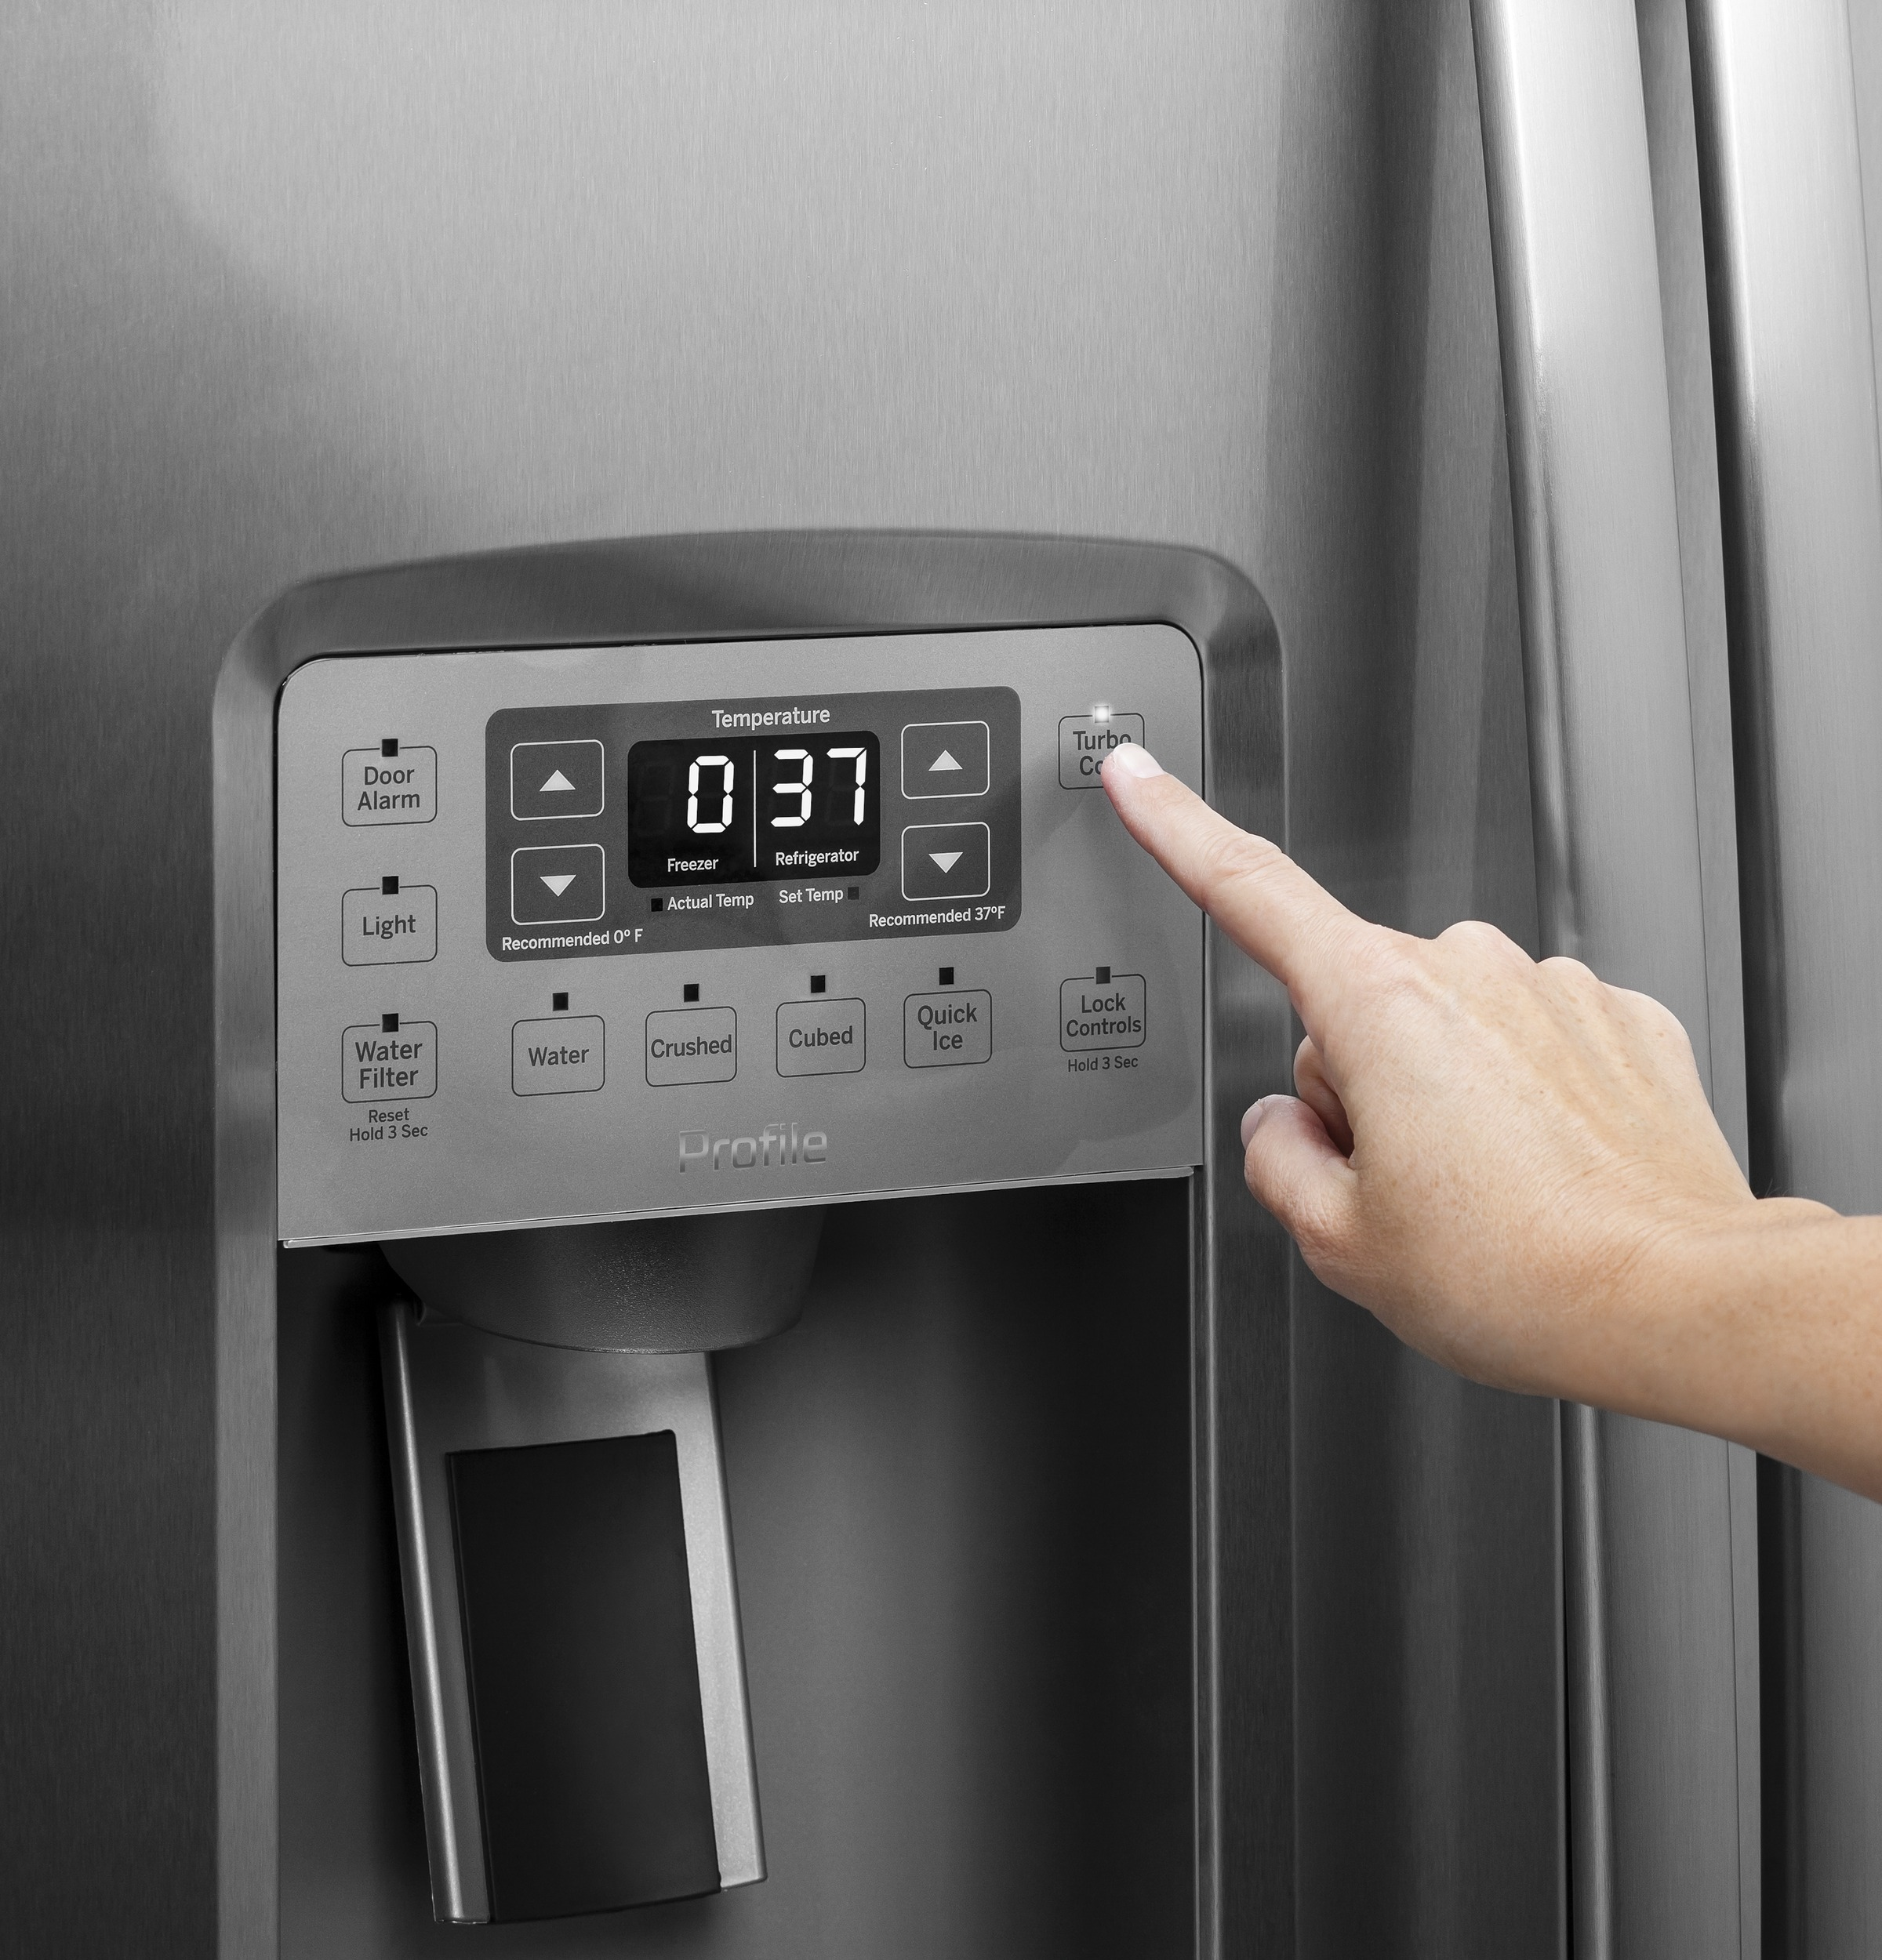 Model: PSE25KBLTS | GE Profile™ Series ENERGY STAR® 25.3 Cu. Ft. Side-by-Side Refrigerator